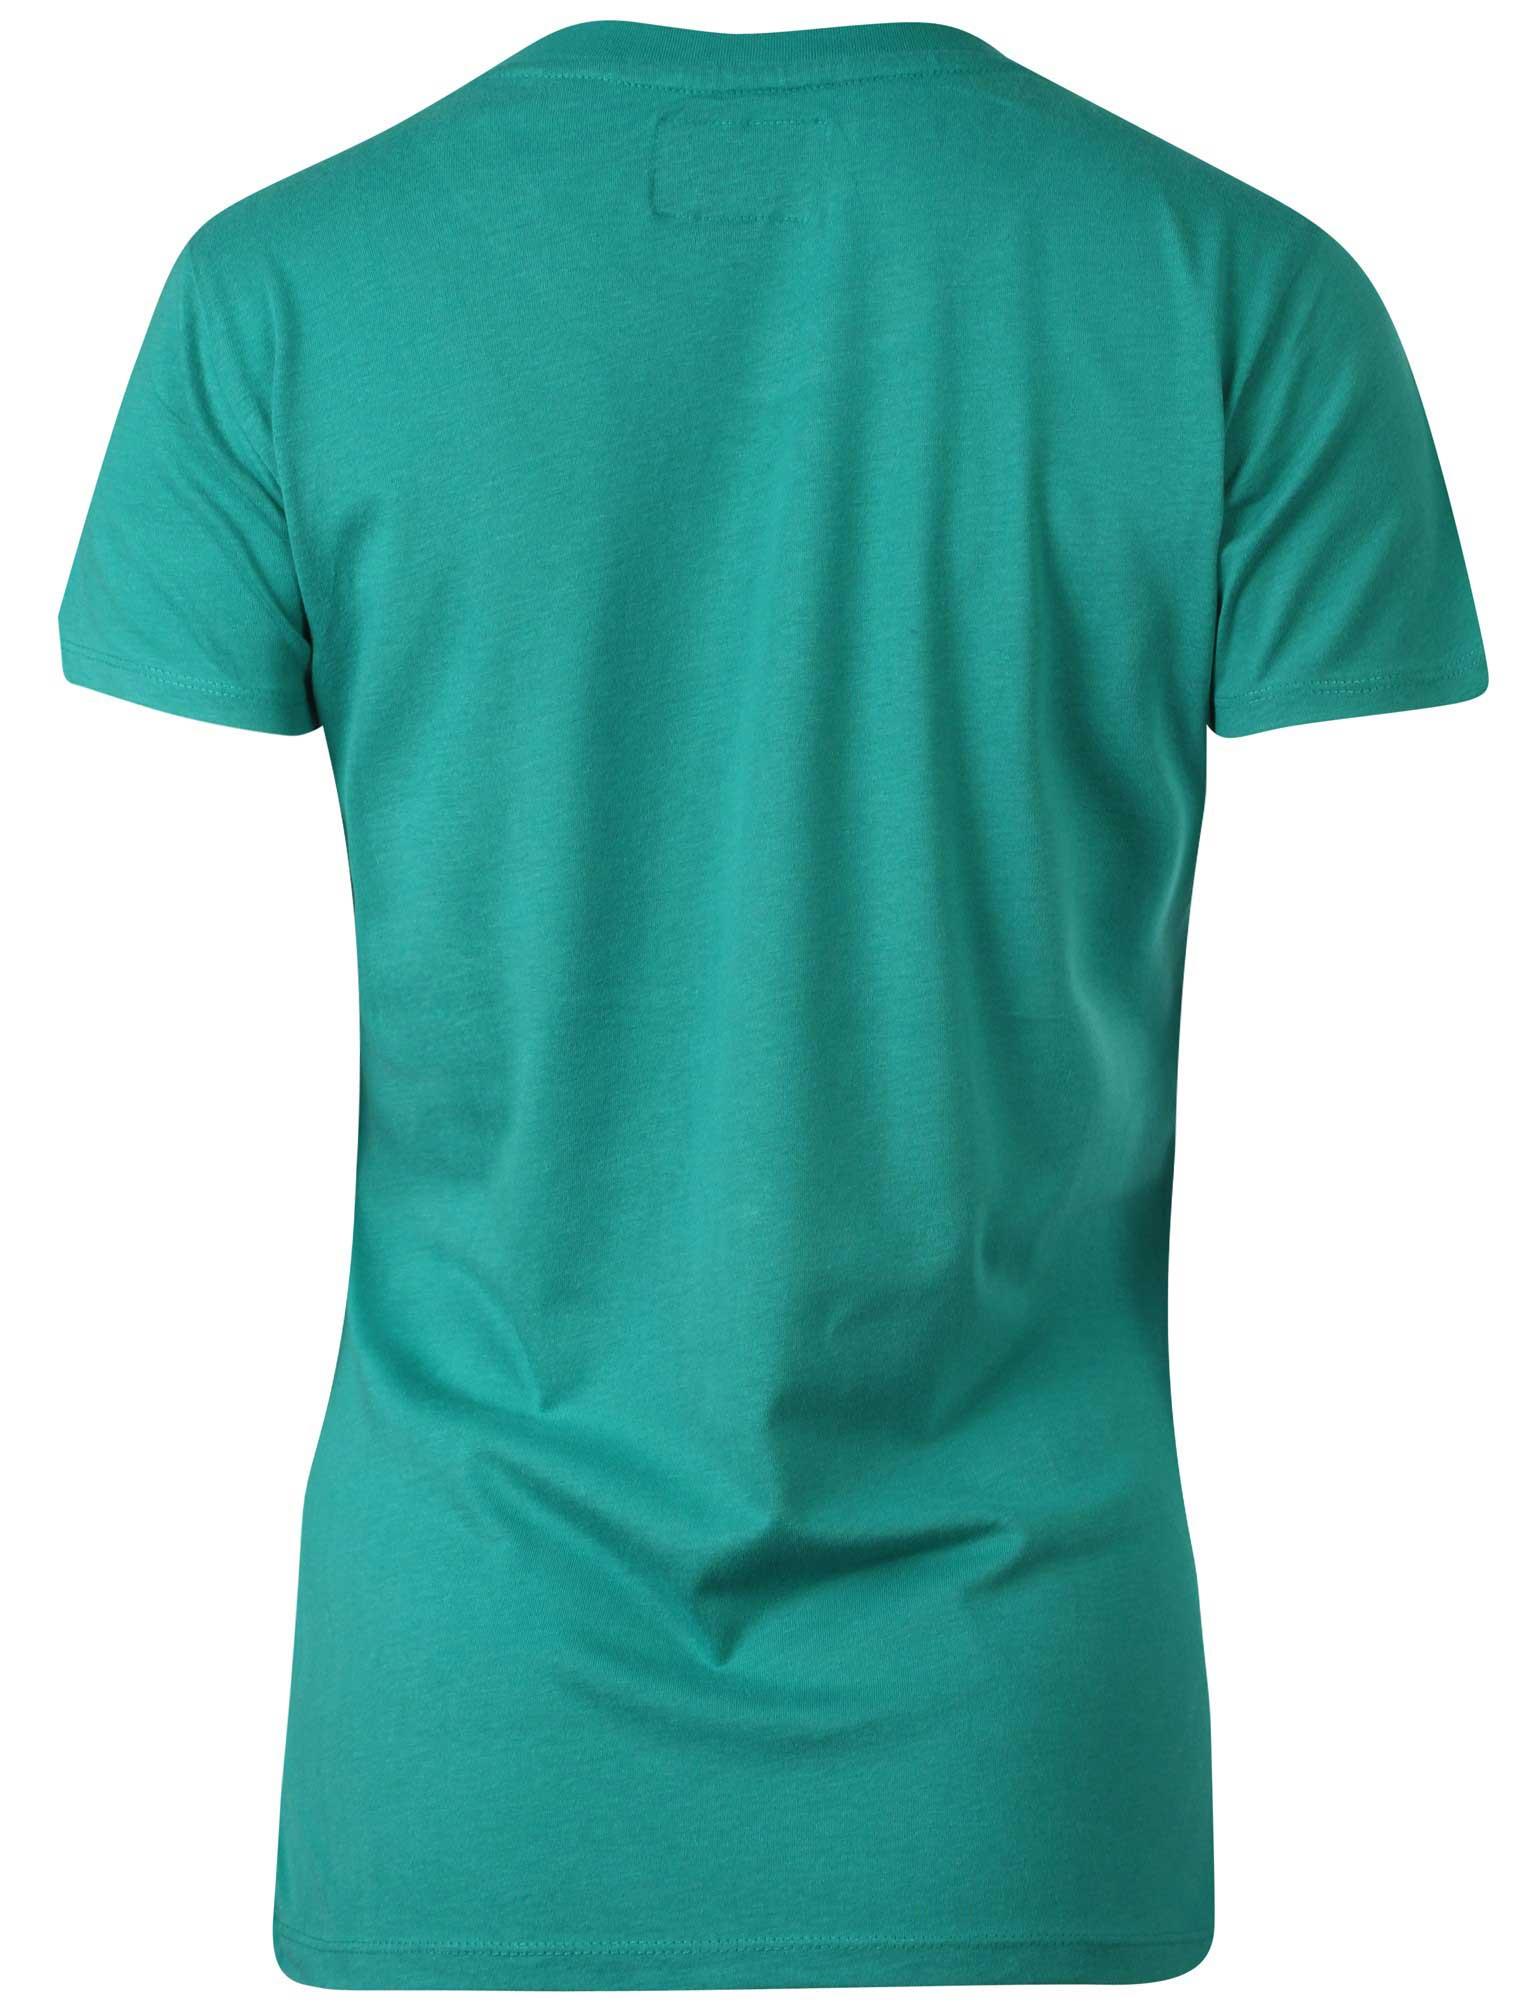 Womens Tokyo Laundry Daisy Ladies Short Sleeve Printed T-Shirt Tee Top Size 8-16